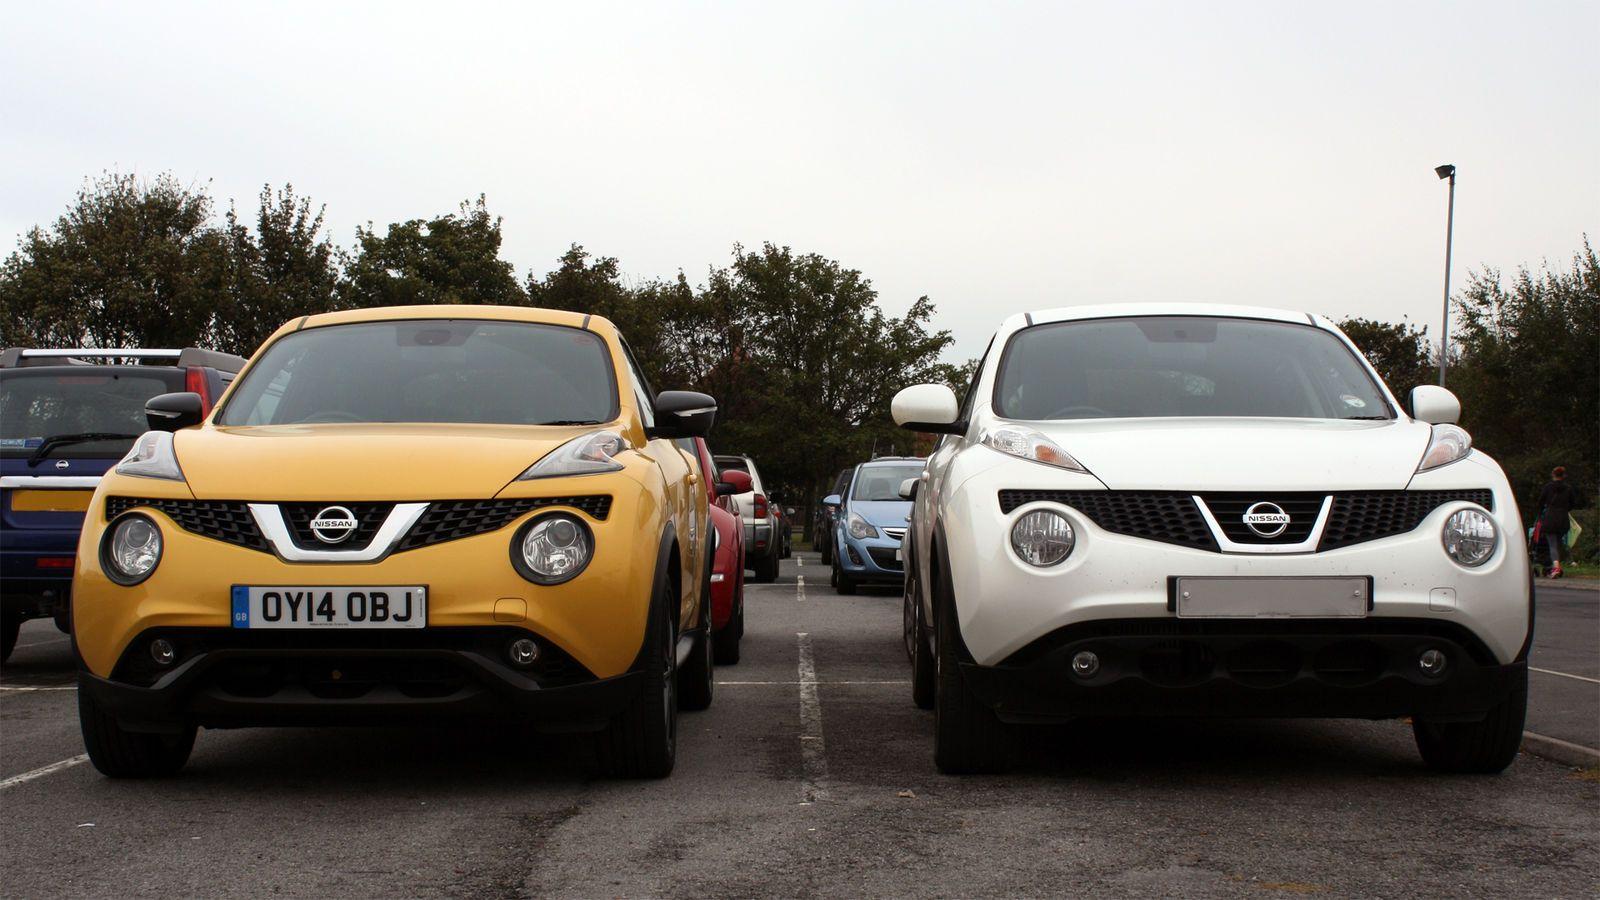 Nissan juke facelift comparo jpg 1600 900